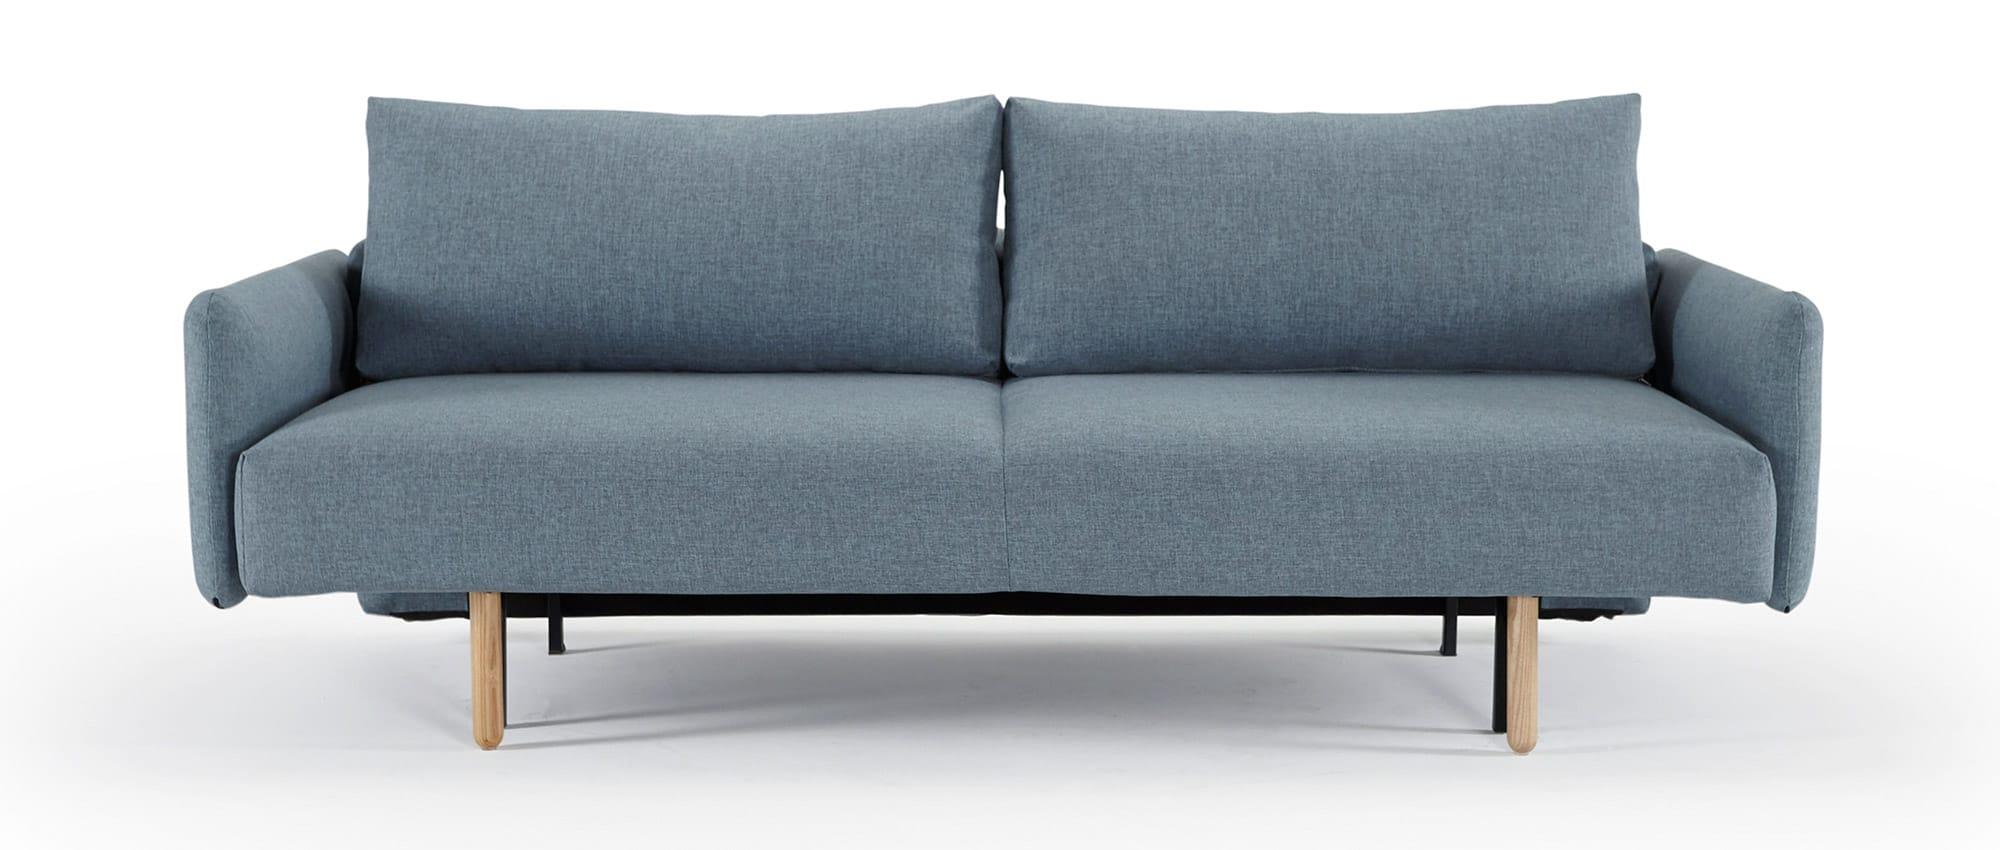 innovation schlafsofa frode mit hellen holzbeinen. Black Bedroom Furniture Sets. Home Design Ideas